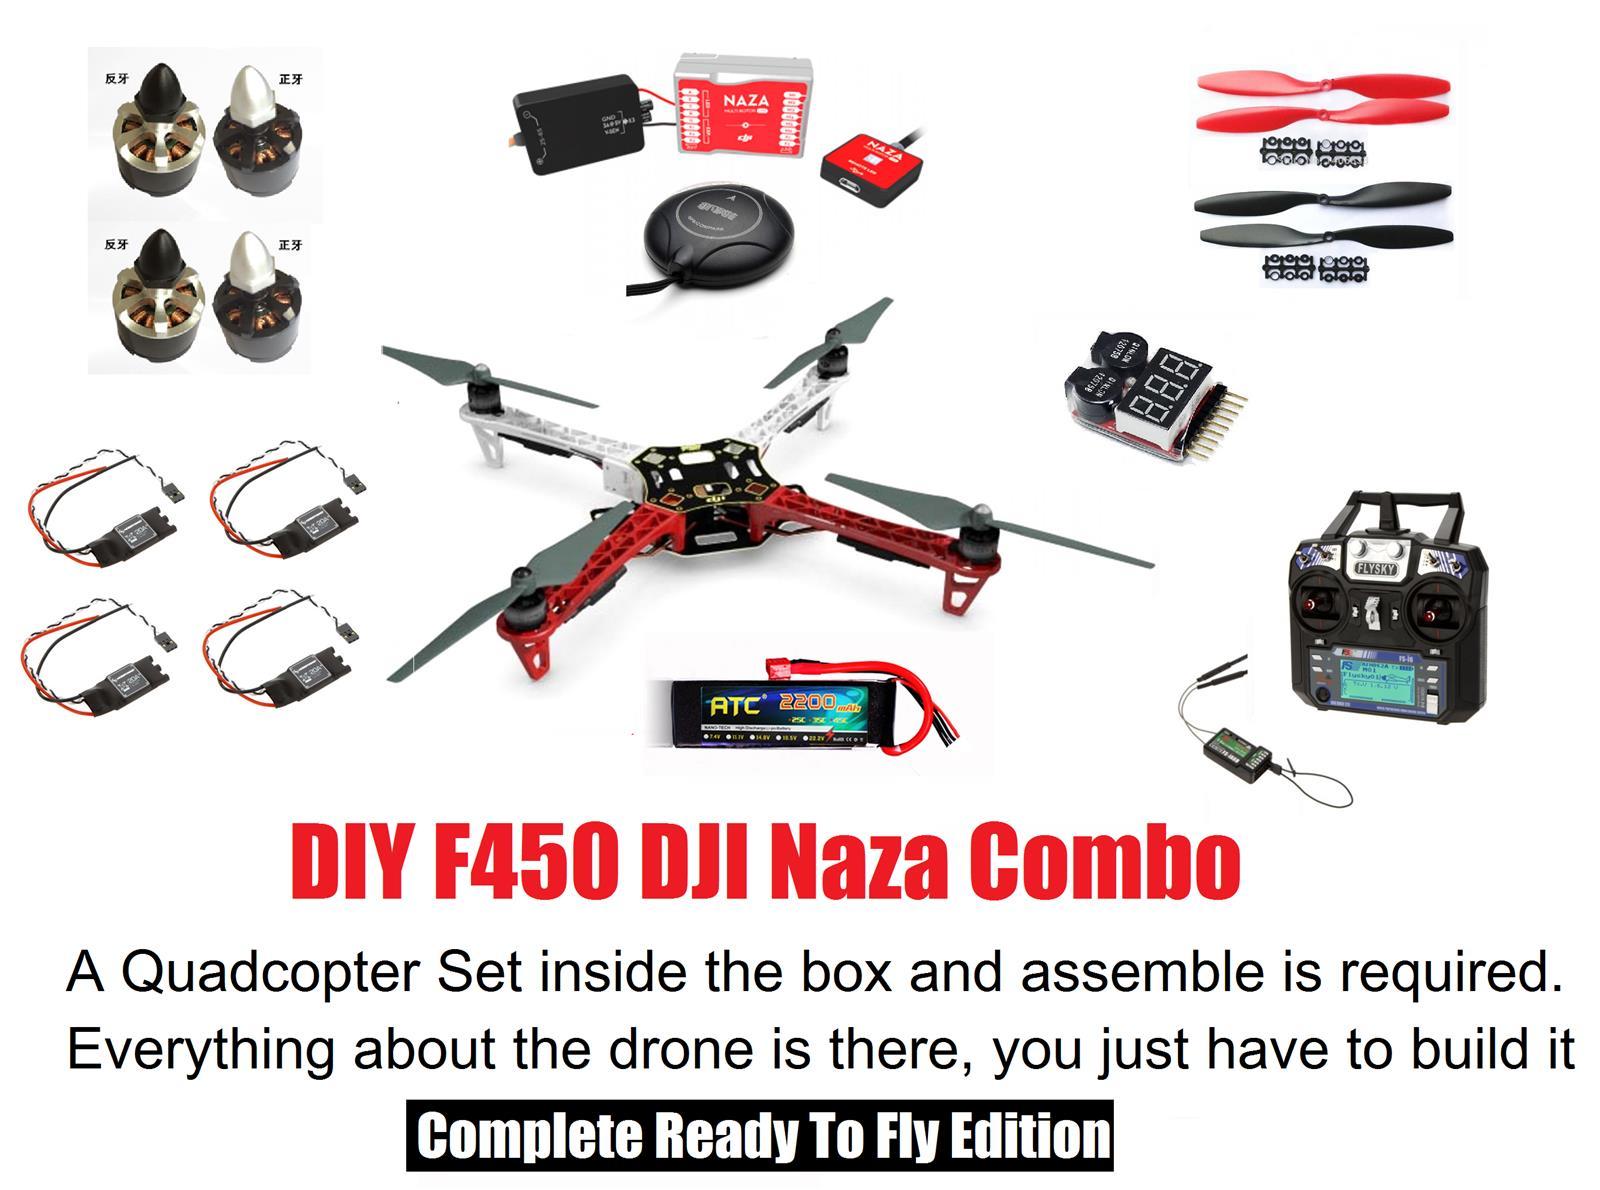 Diy drone f450 quadcopter with dji end 3122019 1207 am diy drone f450 quadcopter with dji naza gps system complete combo solutioingenieria Gallery